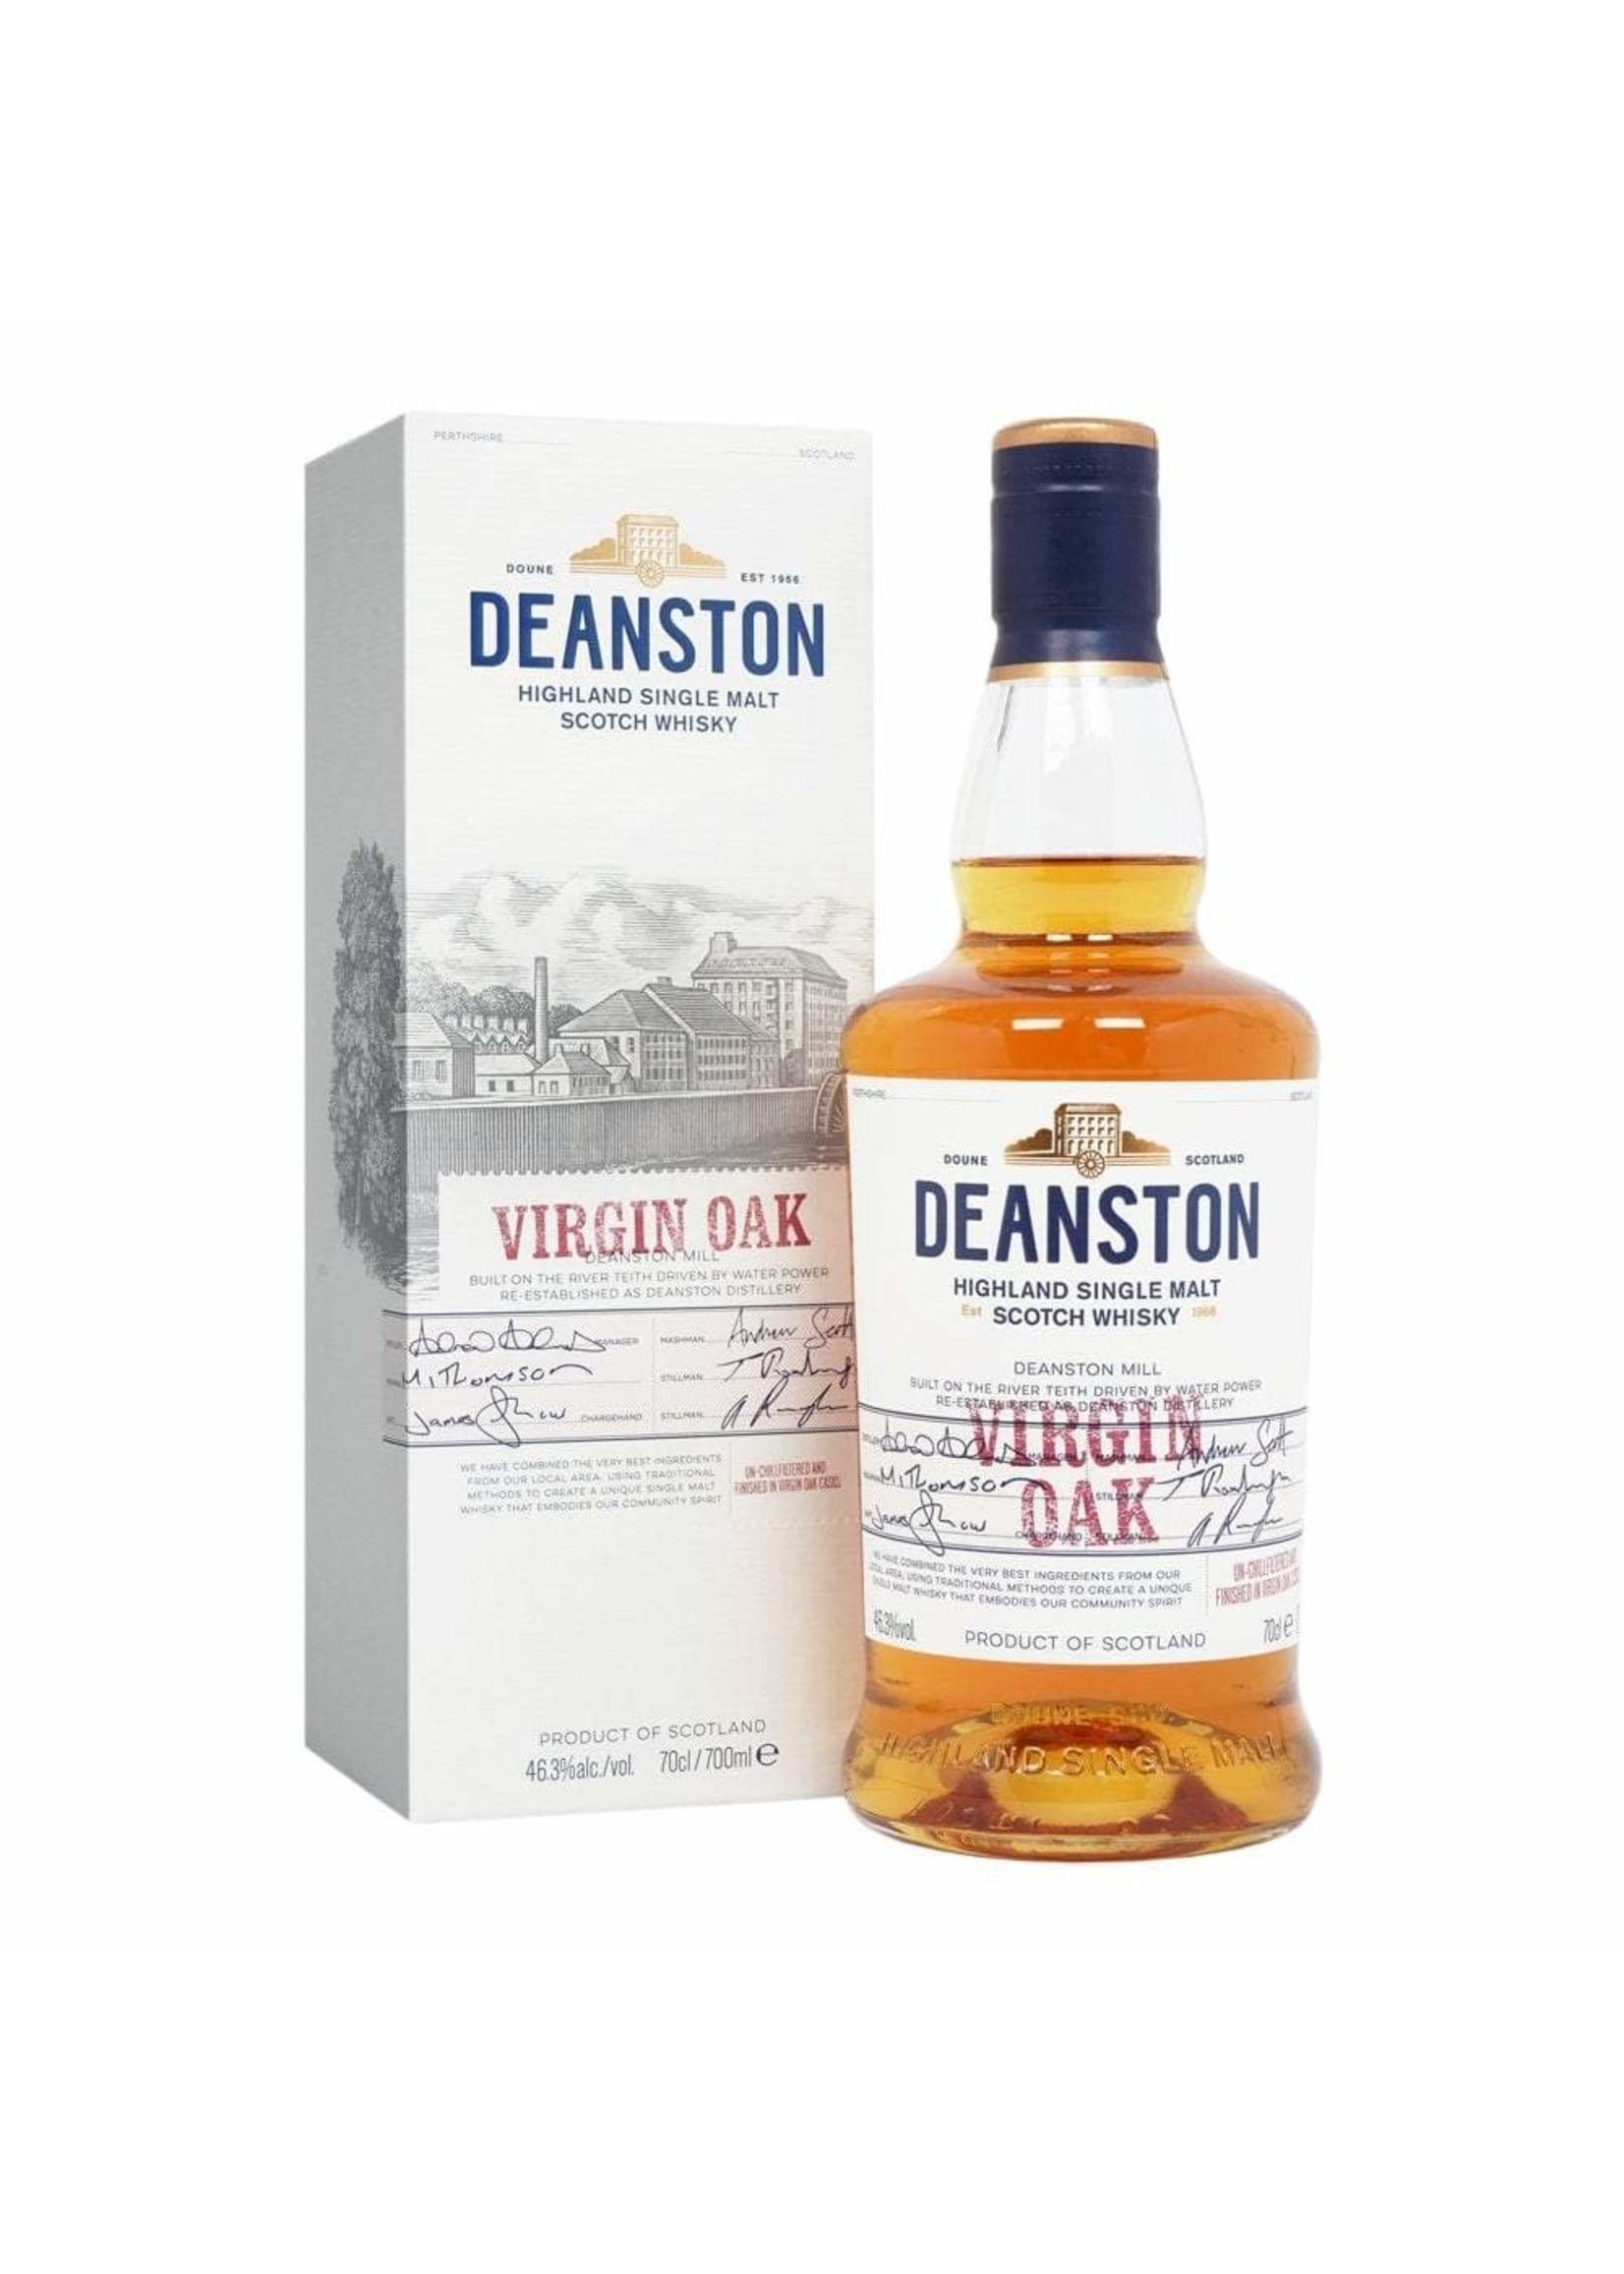 Deanston Deanston / Virgin Oak Single Malt / 750mL